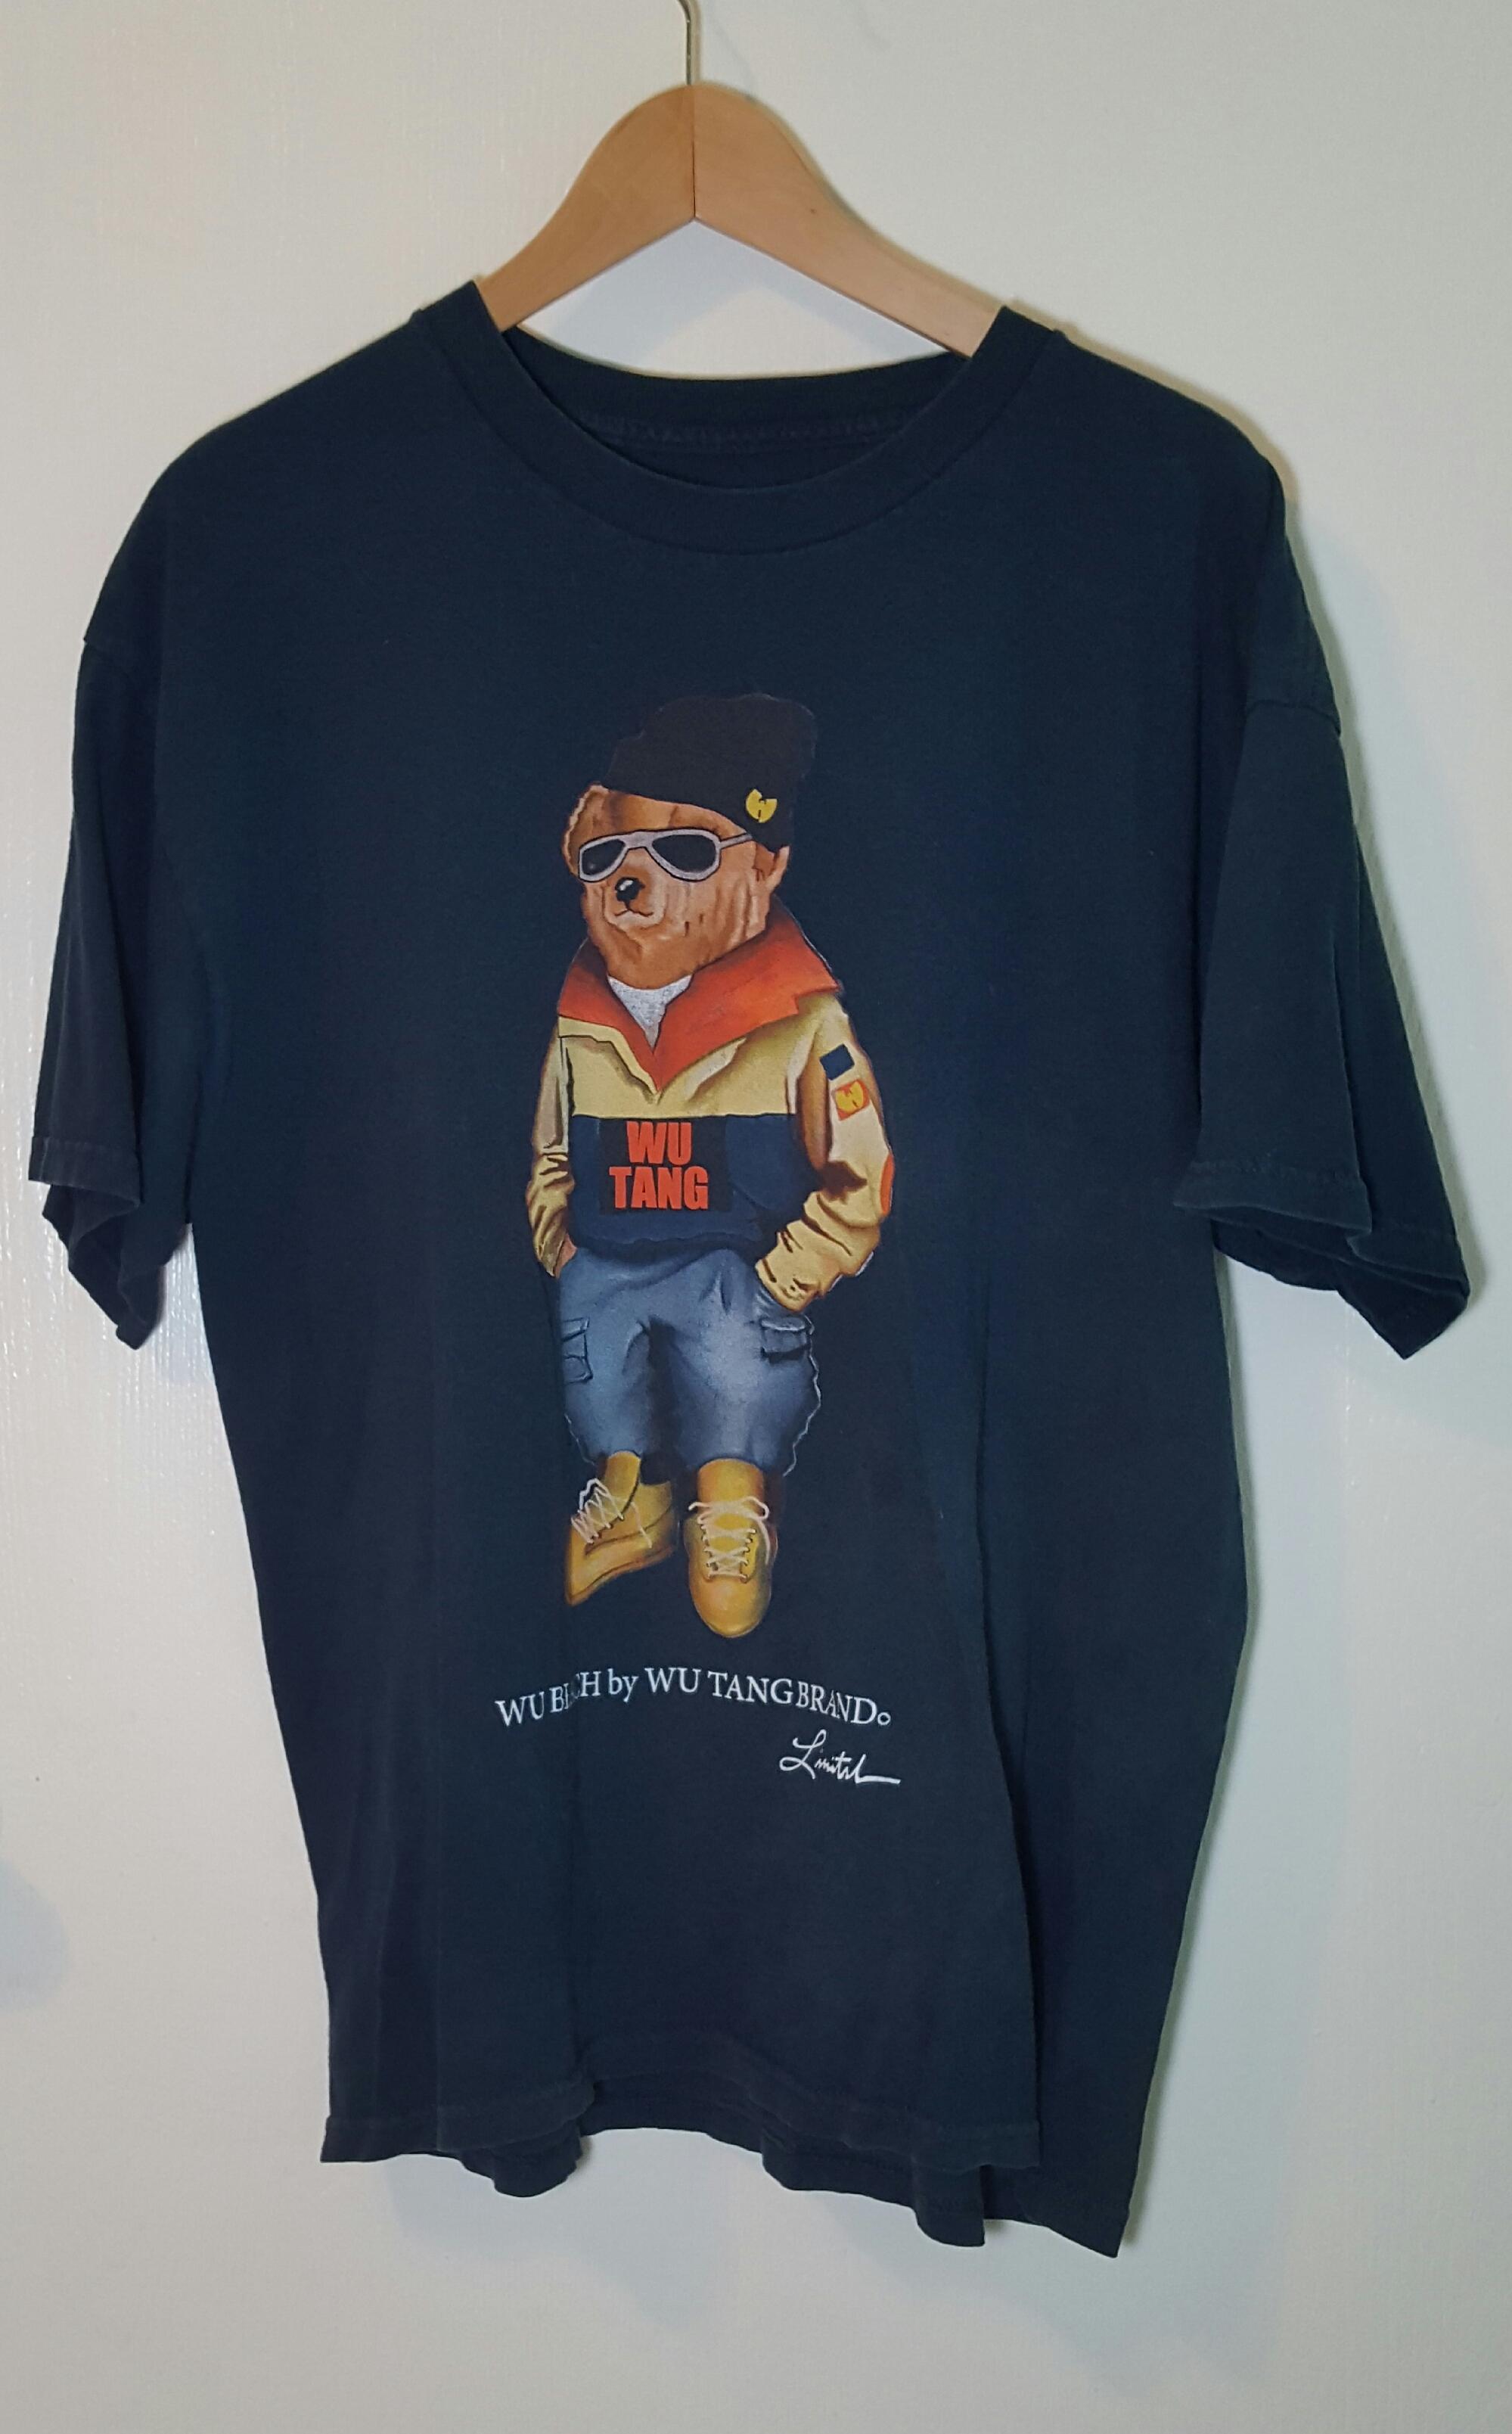 804de19dd8a Wu Tang Clan Wu Bear Graphic Tee Mens XL Size xl - Short Sleeve T-Shirts  for Sale - Grailed